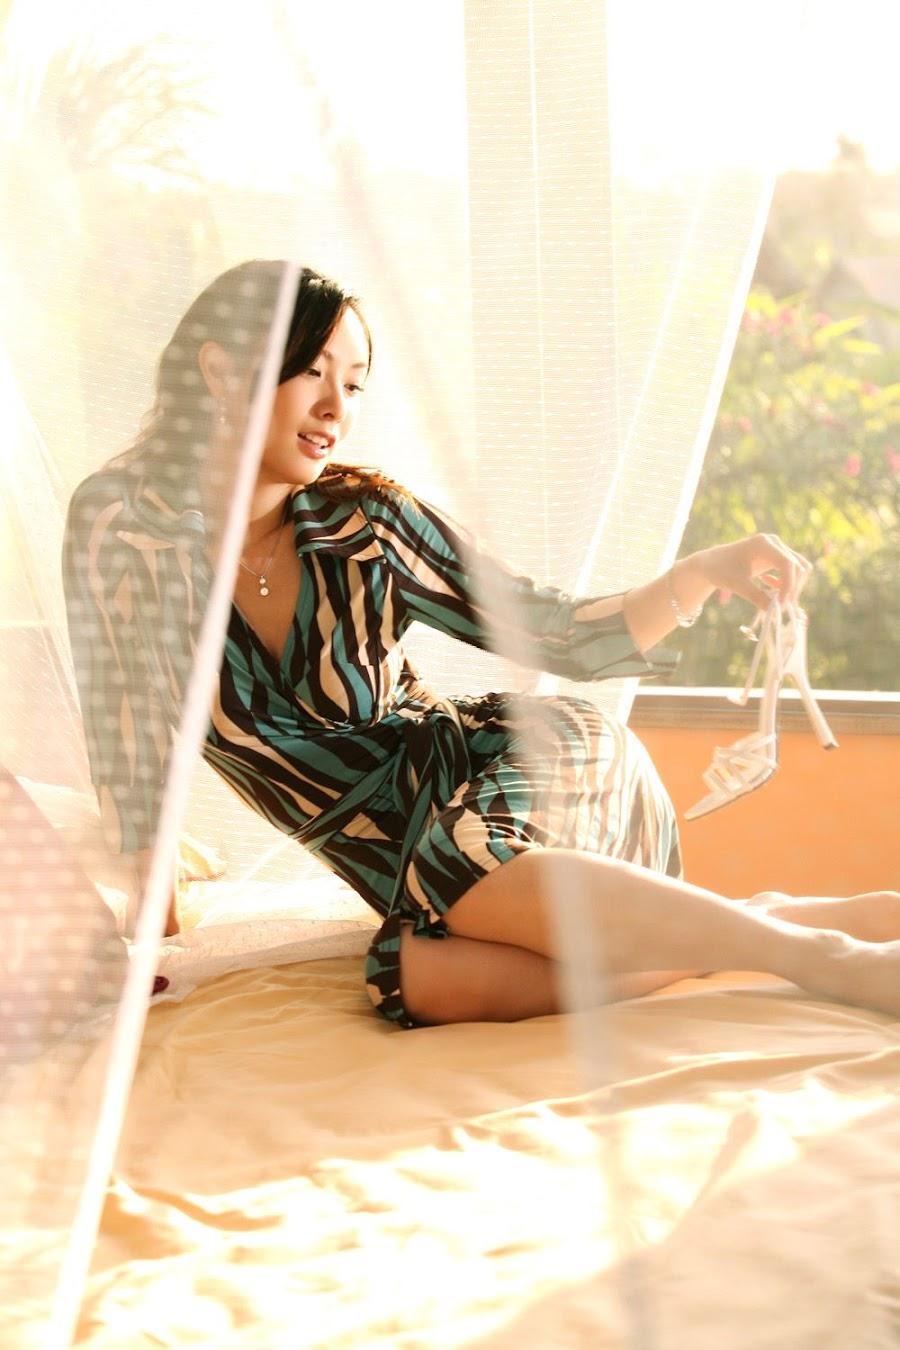 Nao Nagasawa - Japanese actress, singer and model